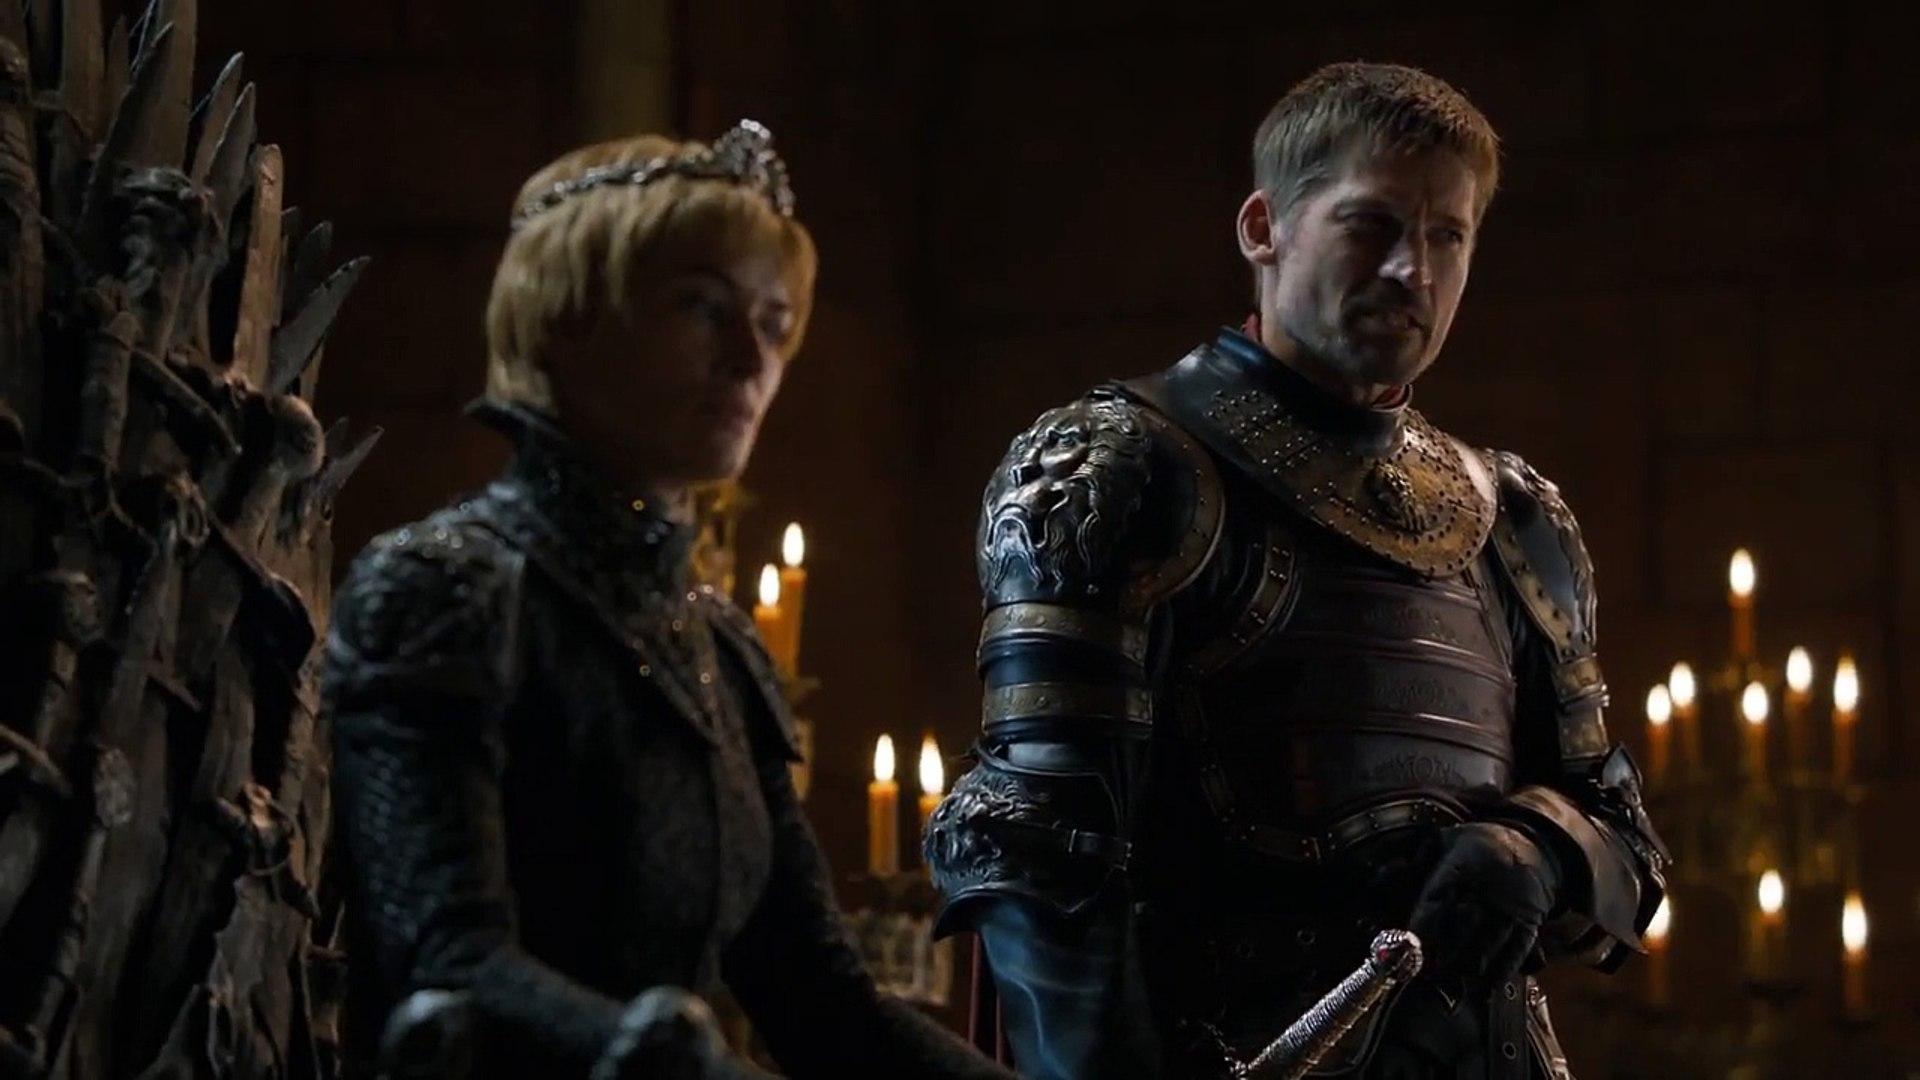 Game Of Thrones 7x01 Euron Greyjoy Meets Cersei Lannister